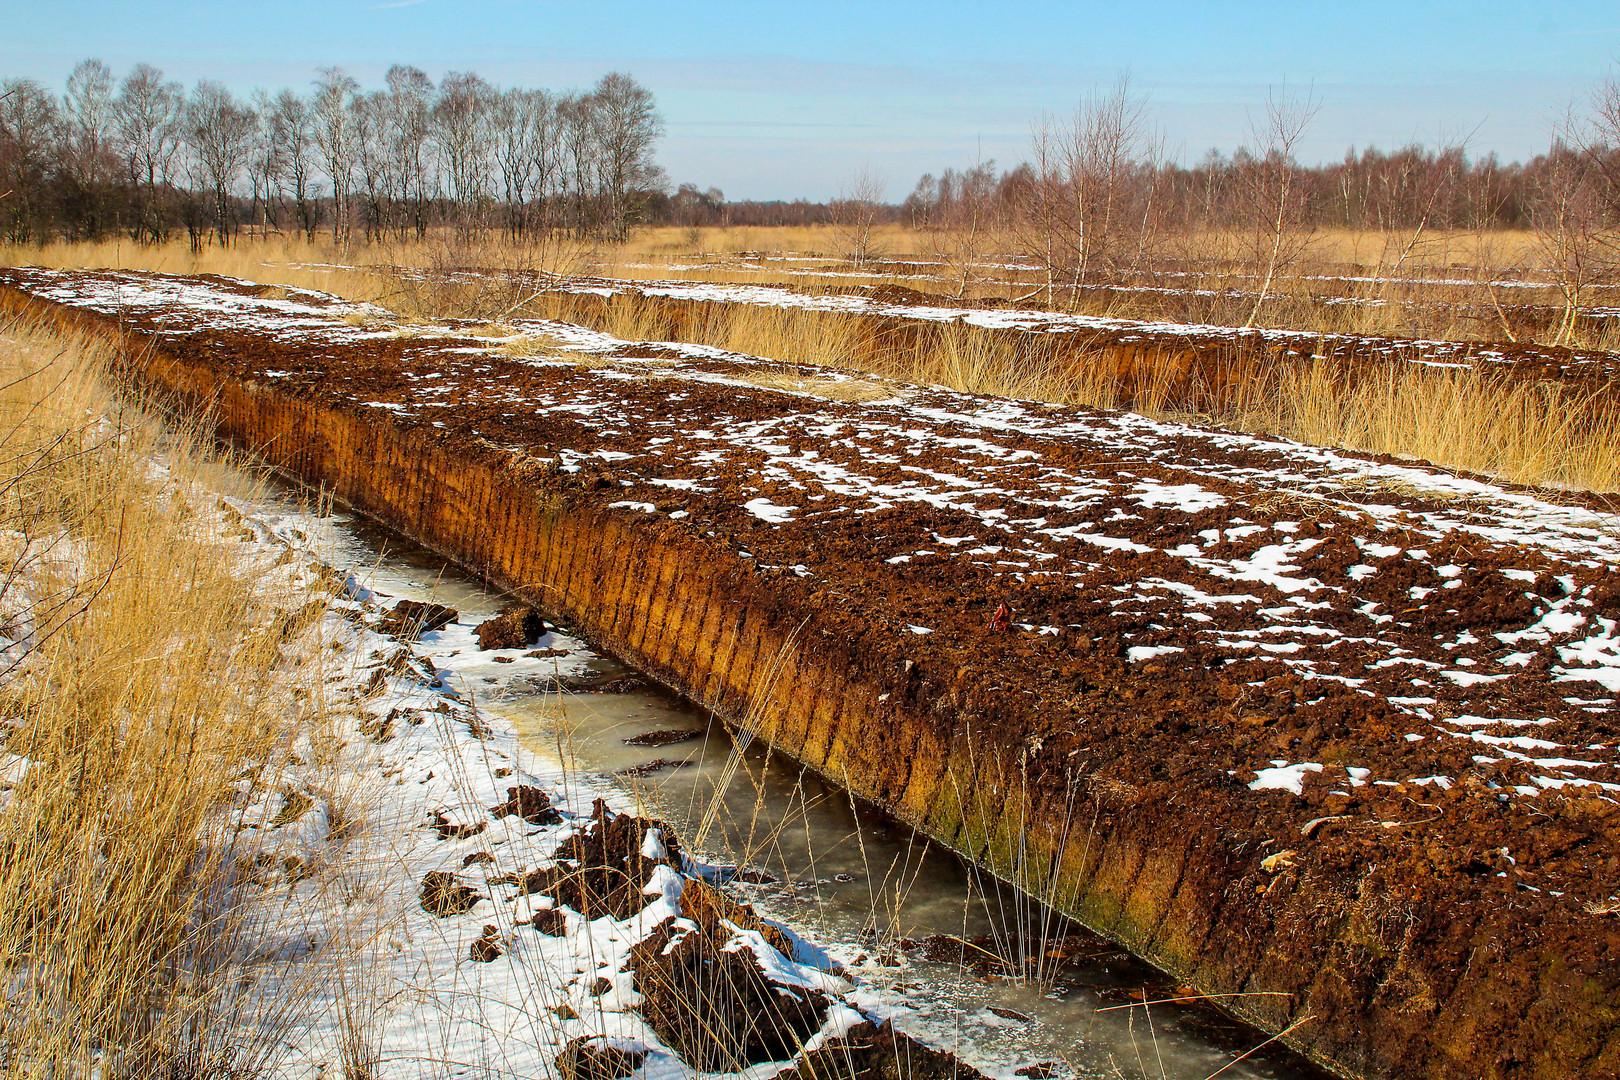 Winter im Moor - die Arbeit ruht